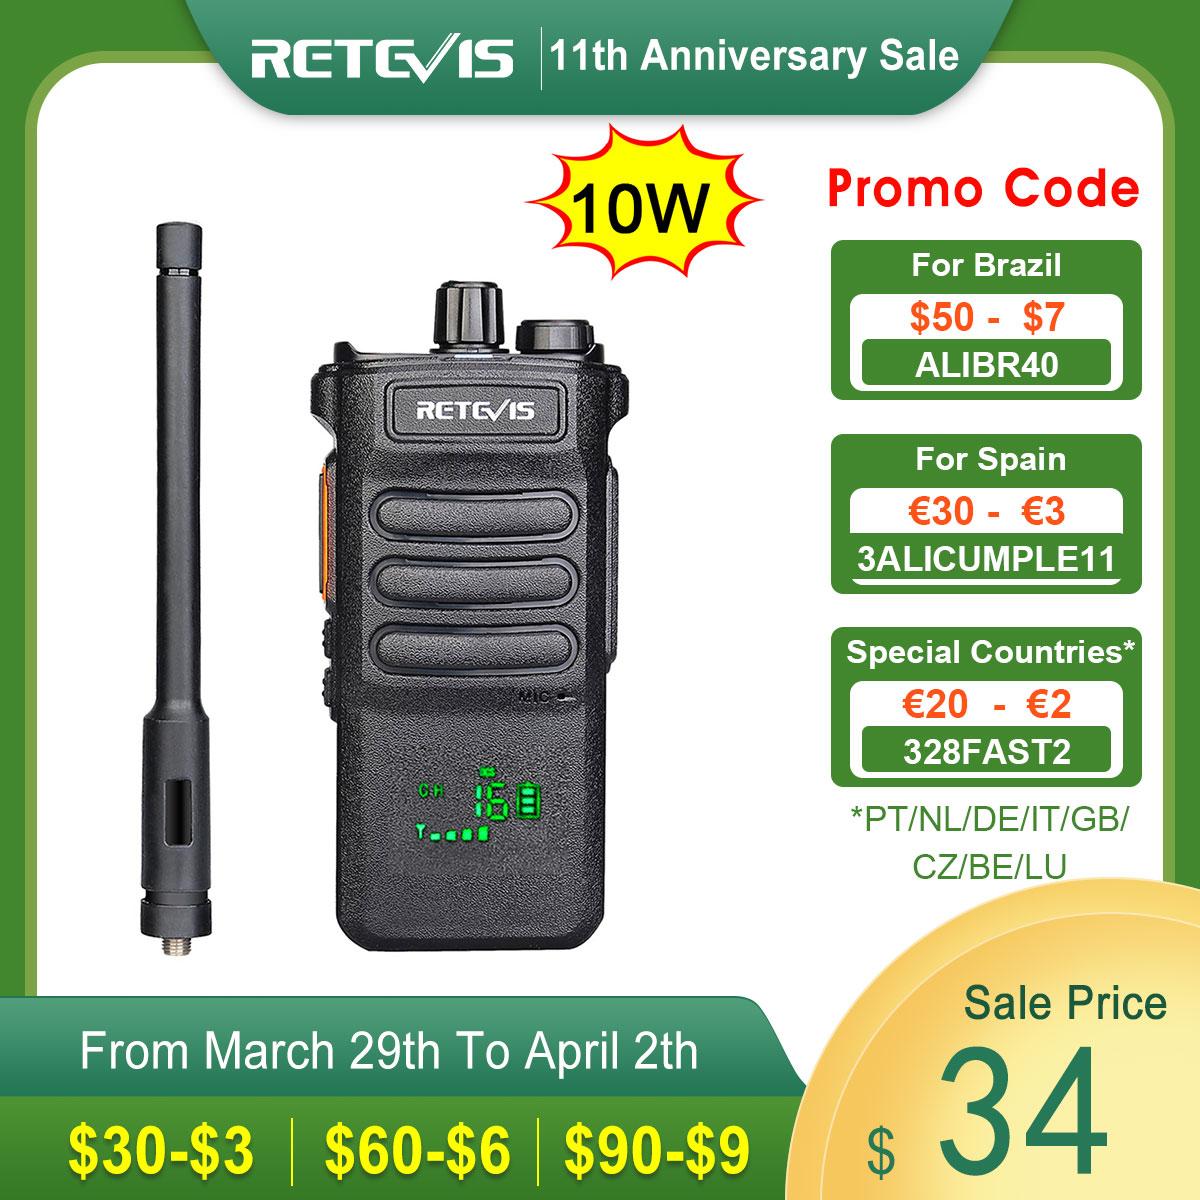 AliExpress - 10W Retevis Walkie Talkie Long Range RT86 Walkie-talkies 1 2 pcs Portable Radio For Hunting Powerful walkie-talkie Two-way radio